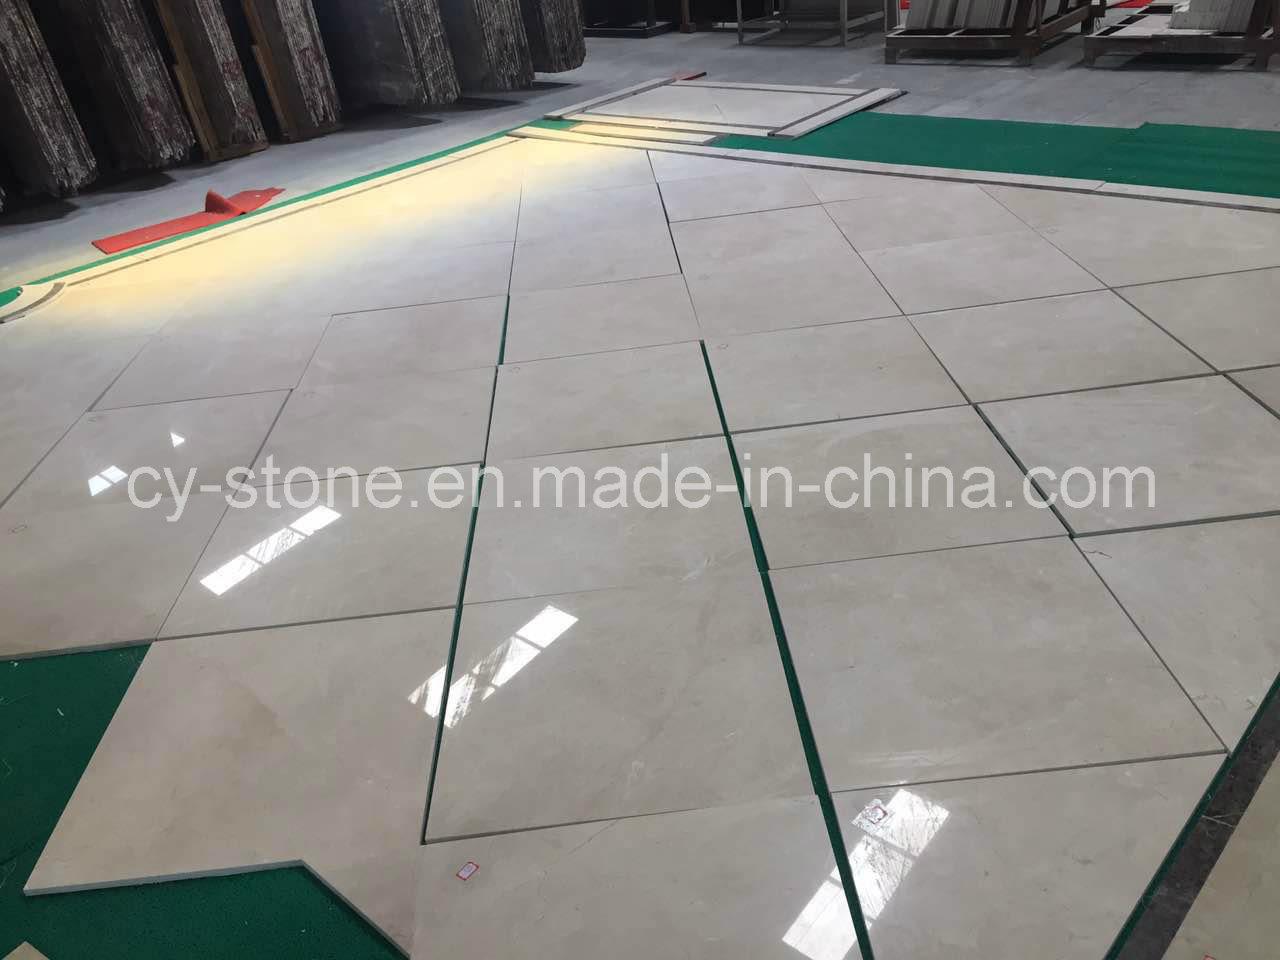 Crema Marfil Beige Marble Granite for Wall/Floor/Bathroom/Countertop